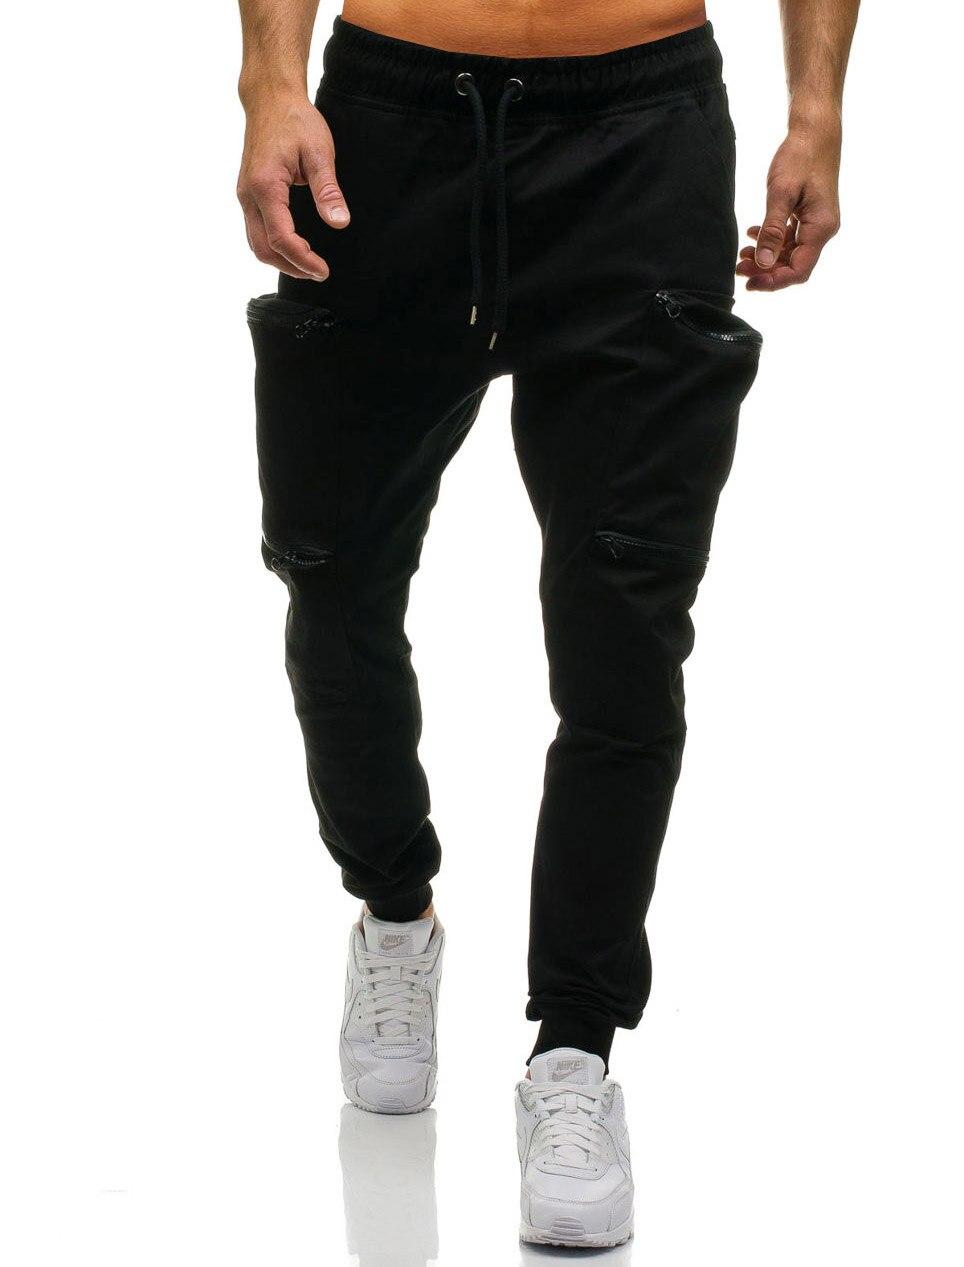 HTB1wvTjL3HqK1RjSZFPq6AwapXau Mens Joggers 2019 New Red Camouflage Multi-Pockets Cargo Pants Men Cotton Harem Pants Hip Hop Trousers Streetwear XXXL